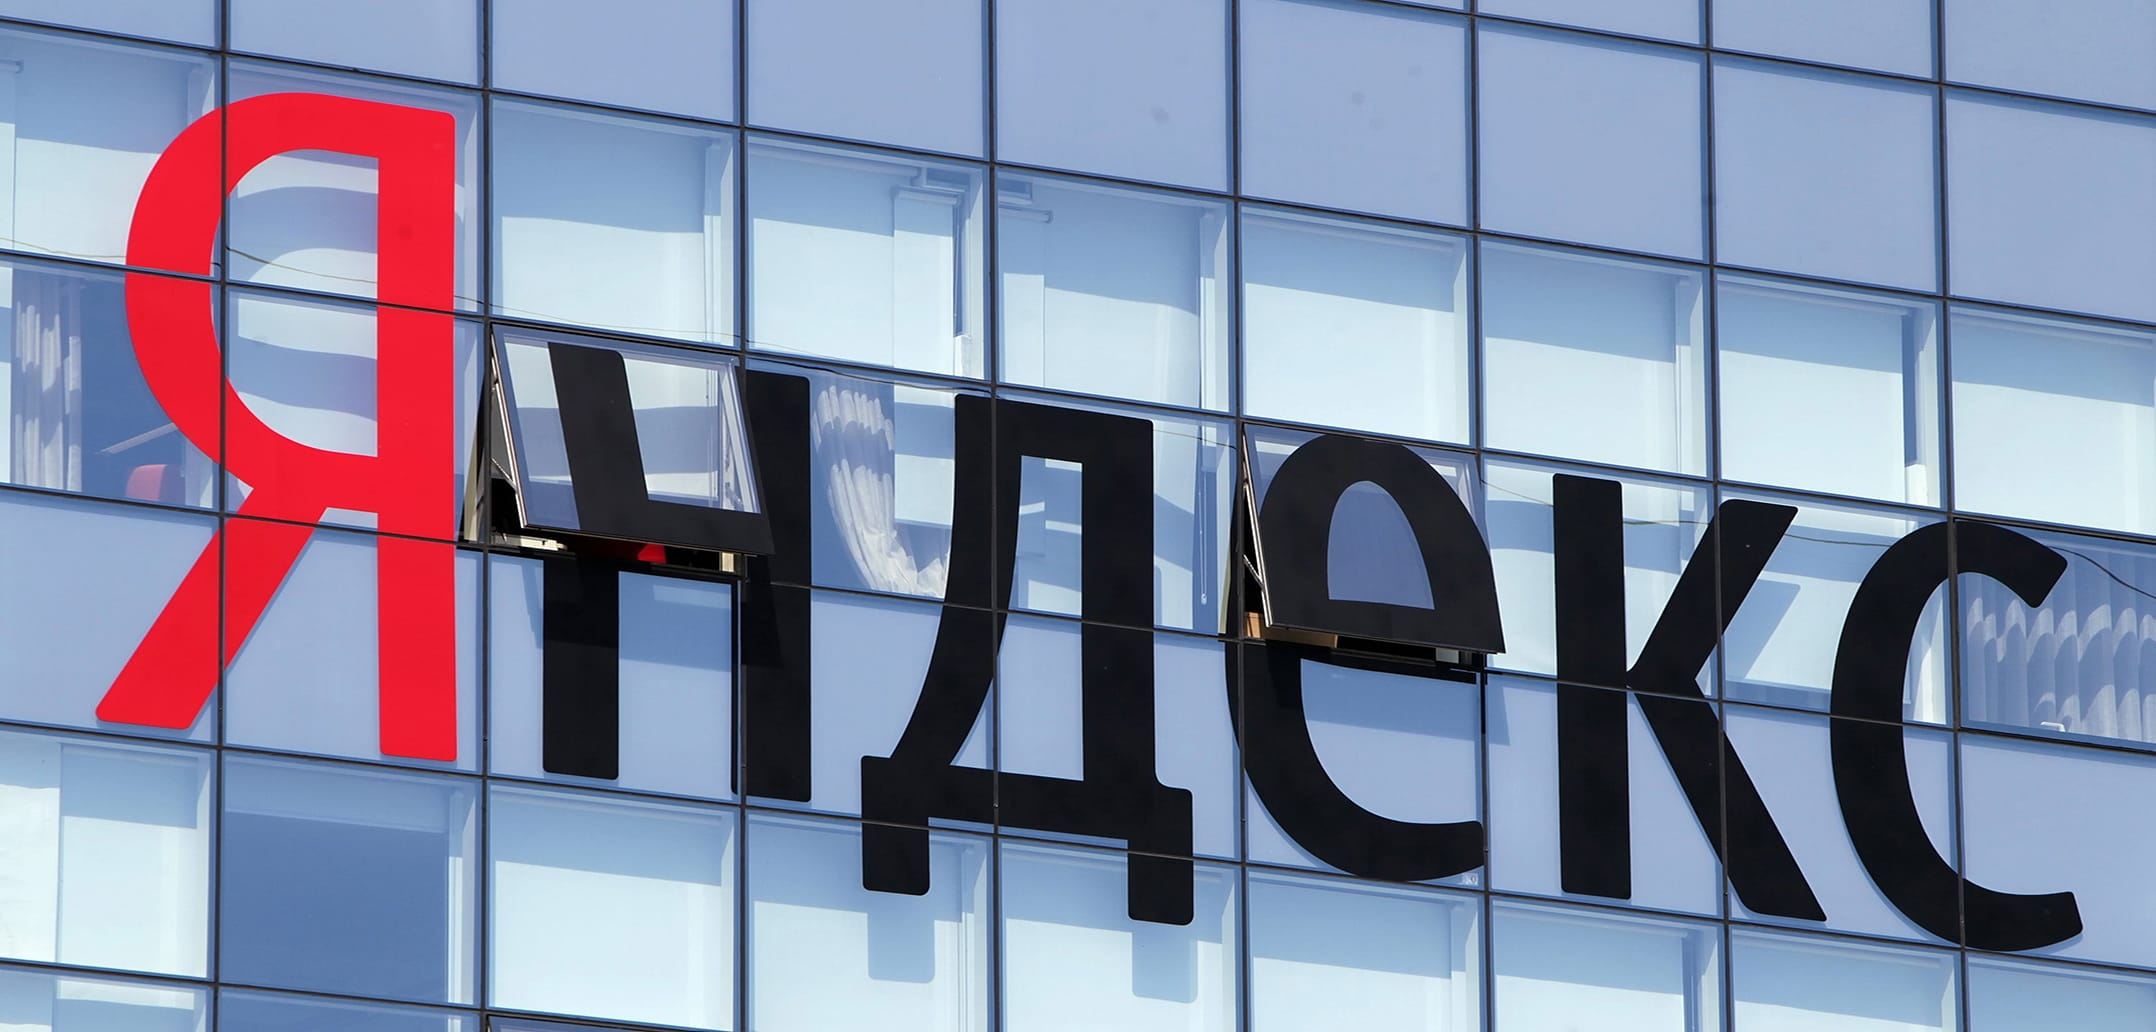 Сбербанк инвестирует в яндекс маркет онлайн калькулятор кредитов белгазпромбанк